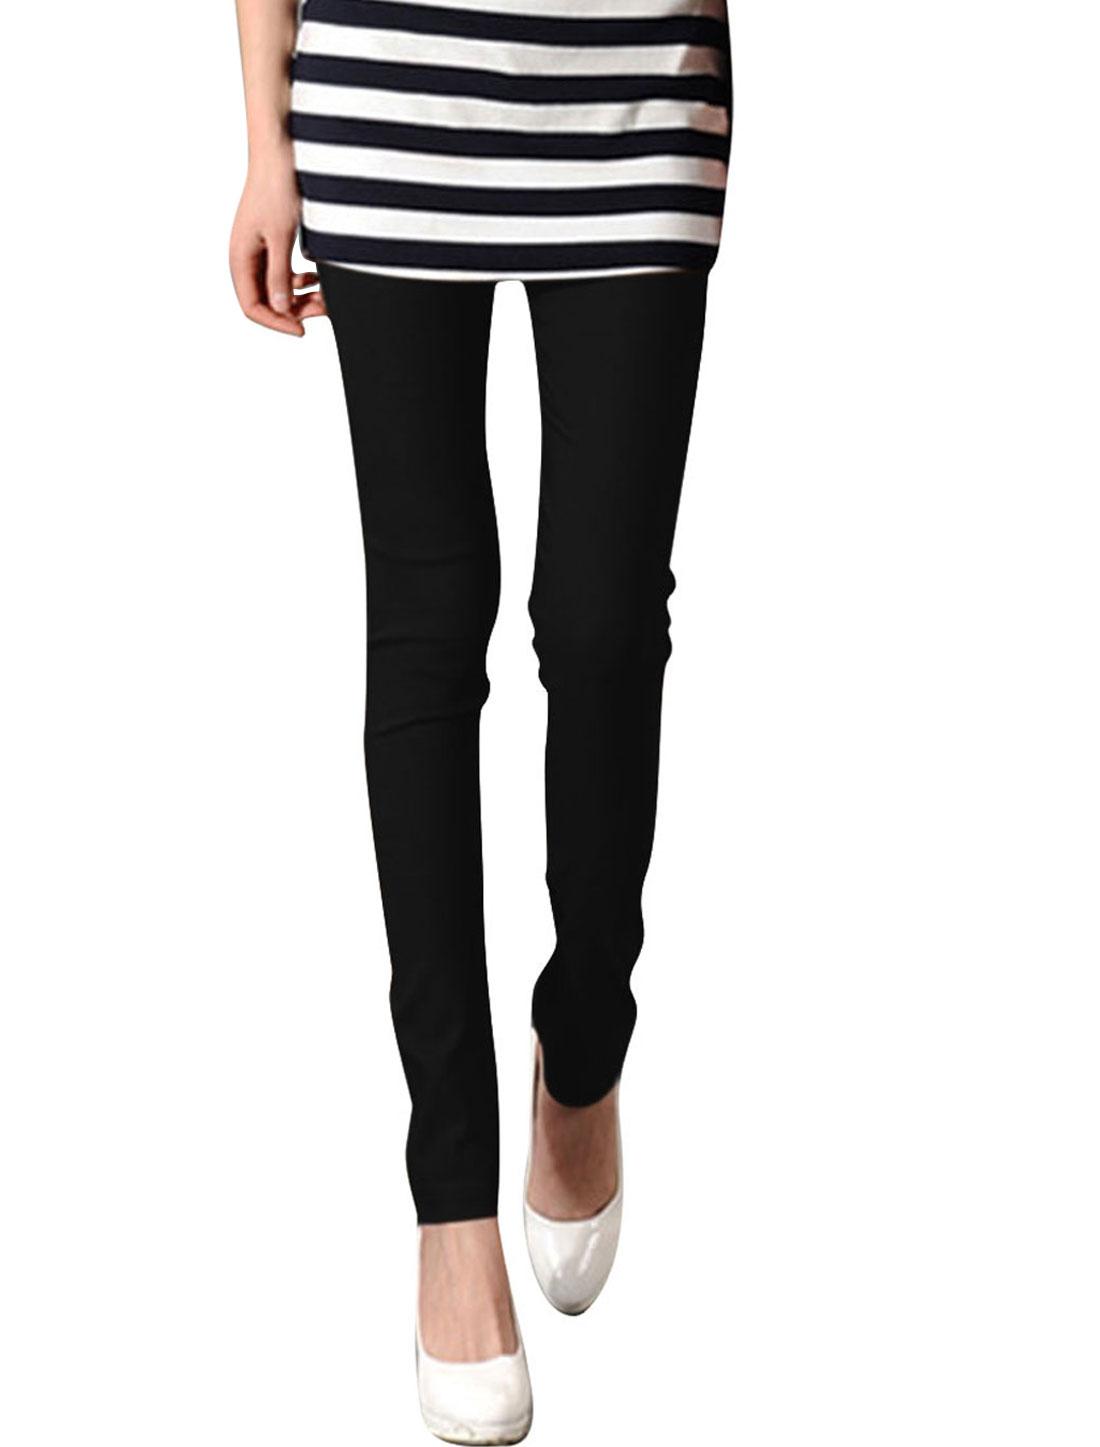 Ladies Stretchy Waist Skinny Fit Style Fashion Summer Legging XS Black